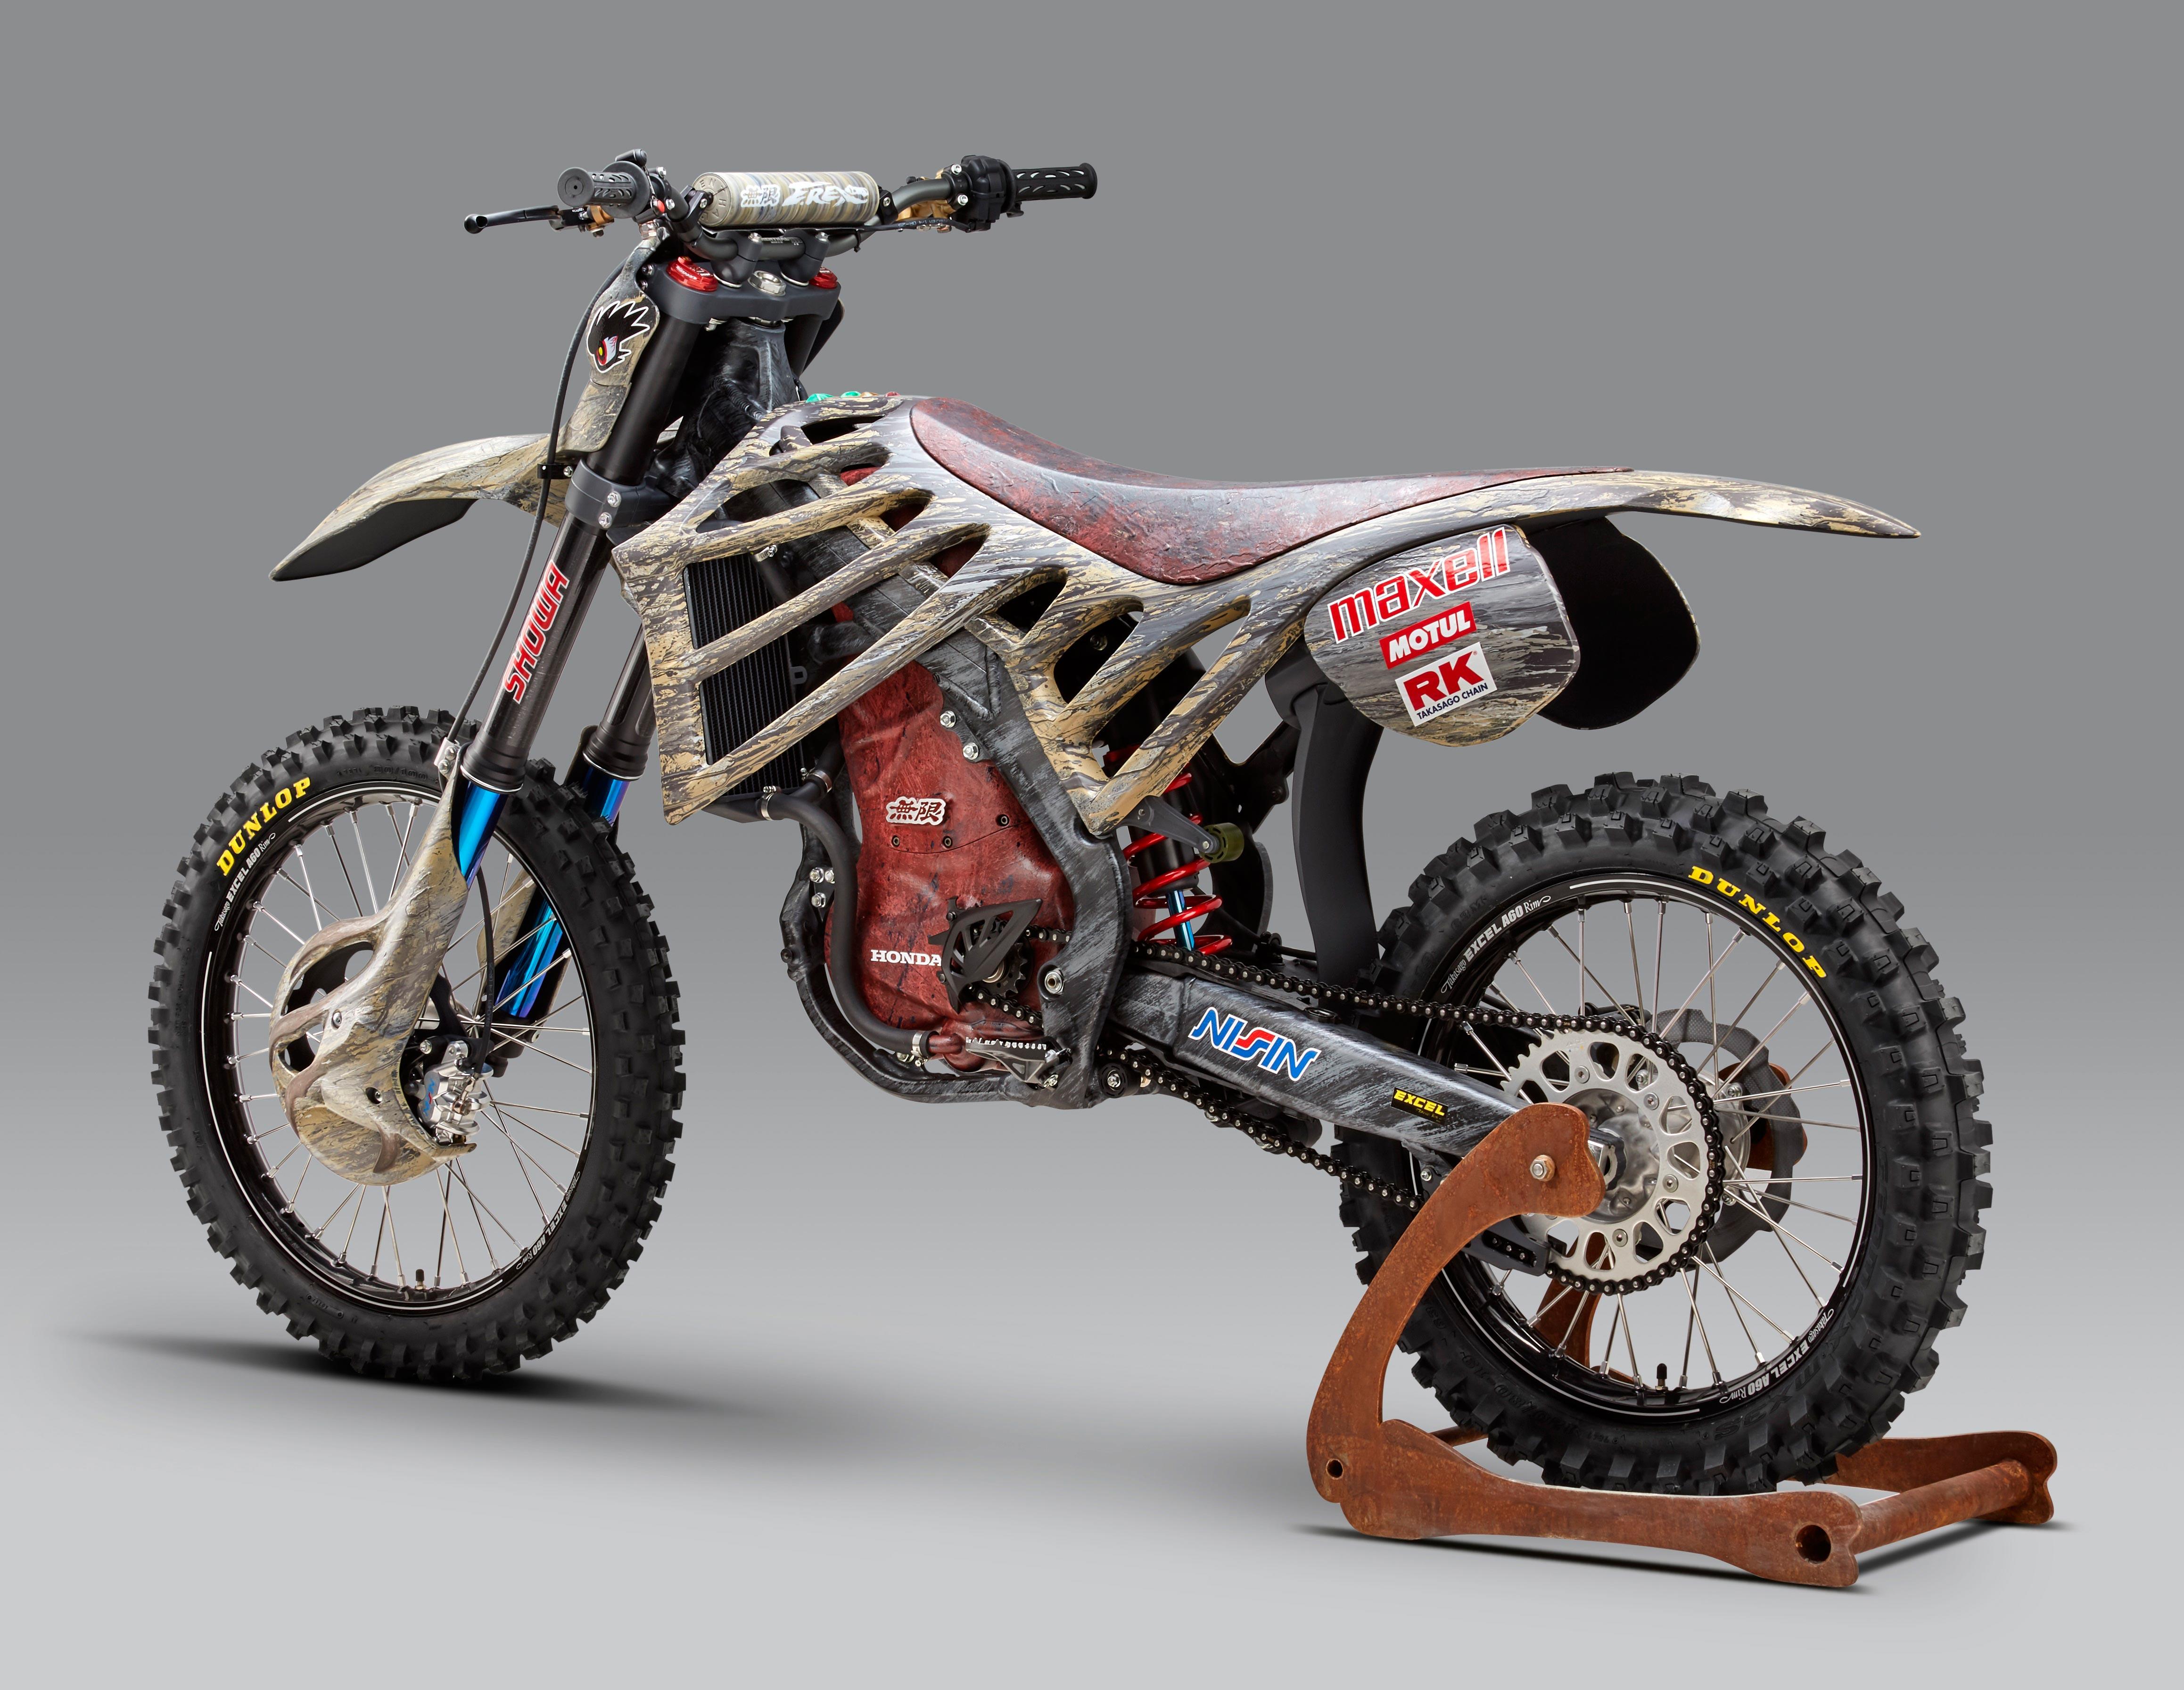 Mugen Debuts An Electric Motocross Race Bike